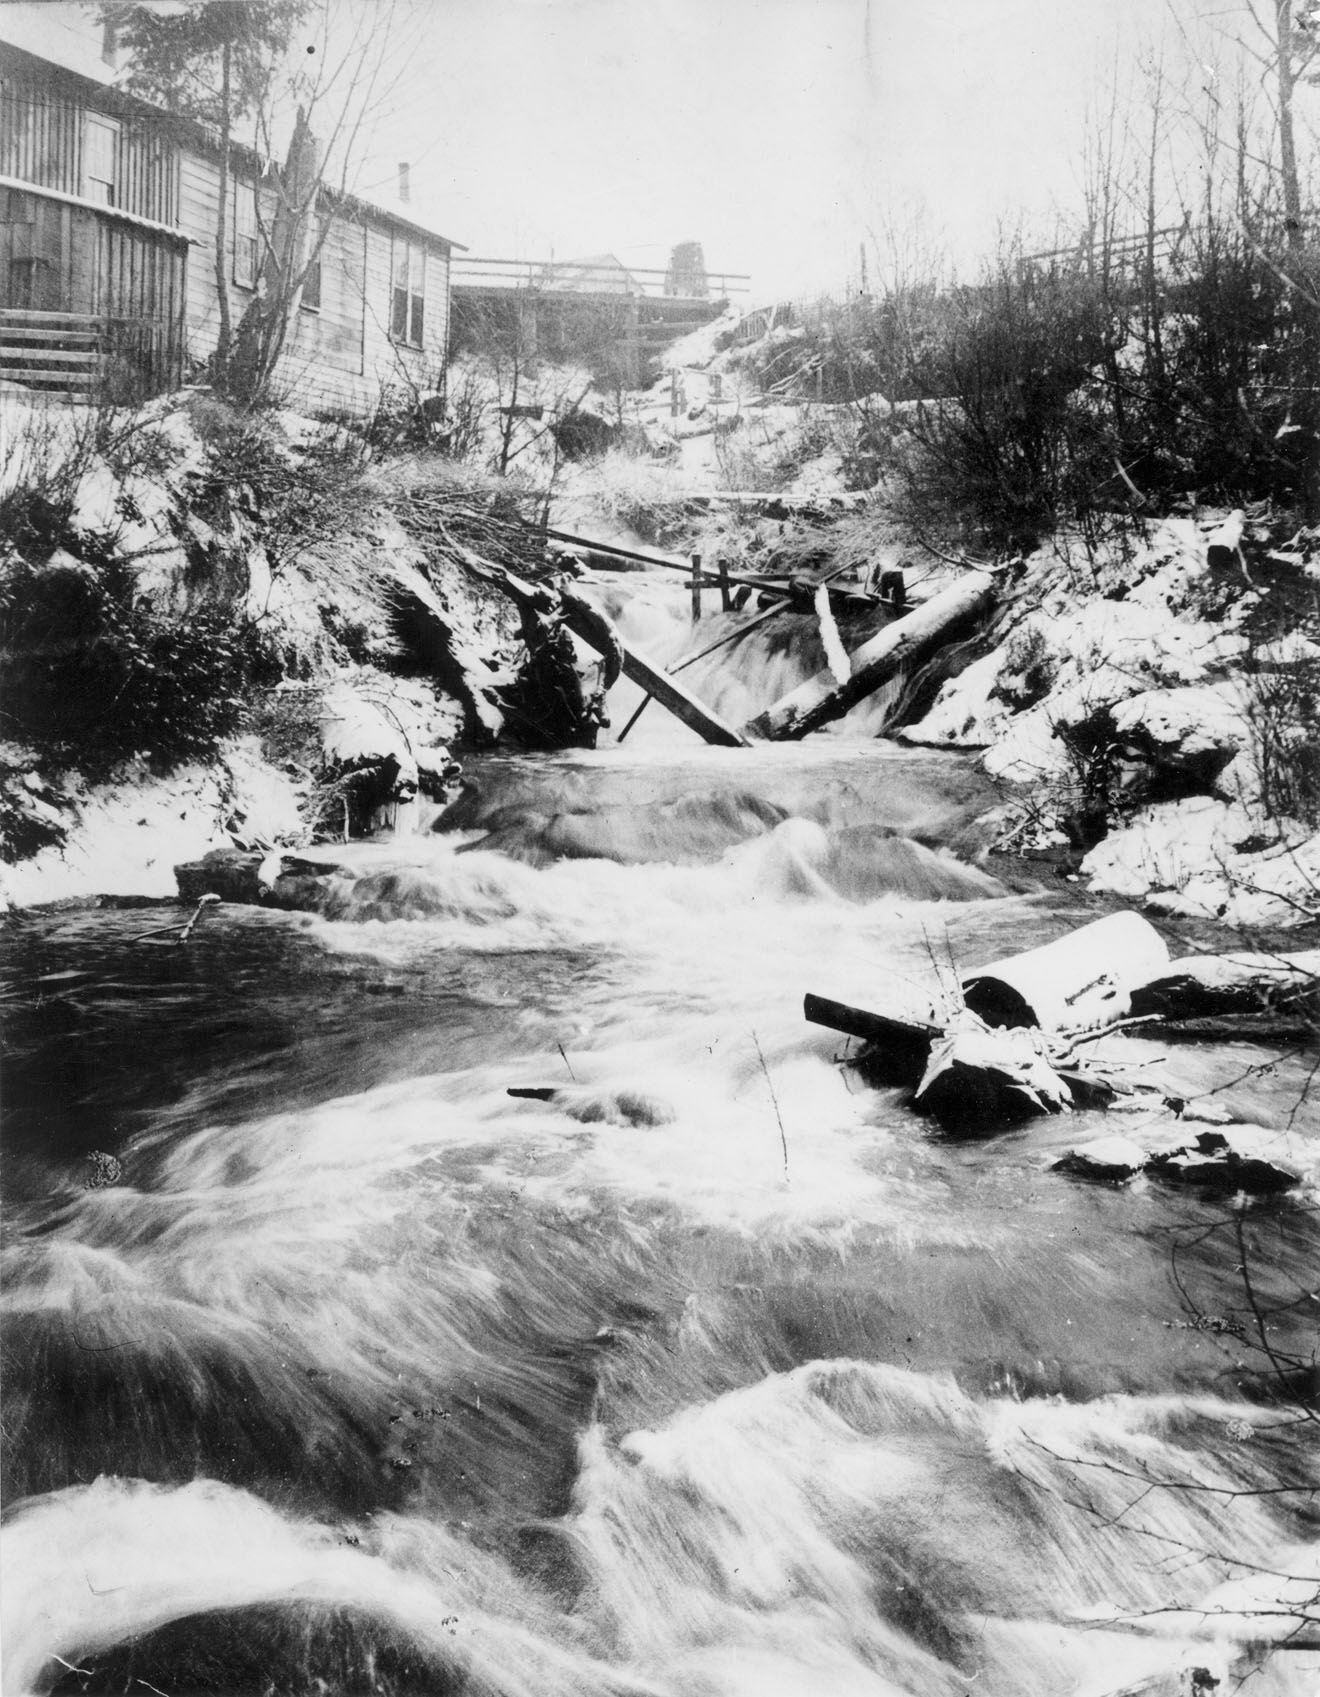 Creek falls below picket bridge 1880 with images